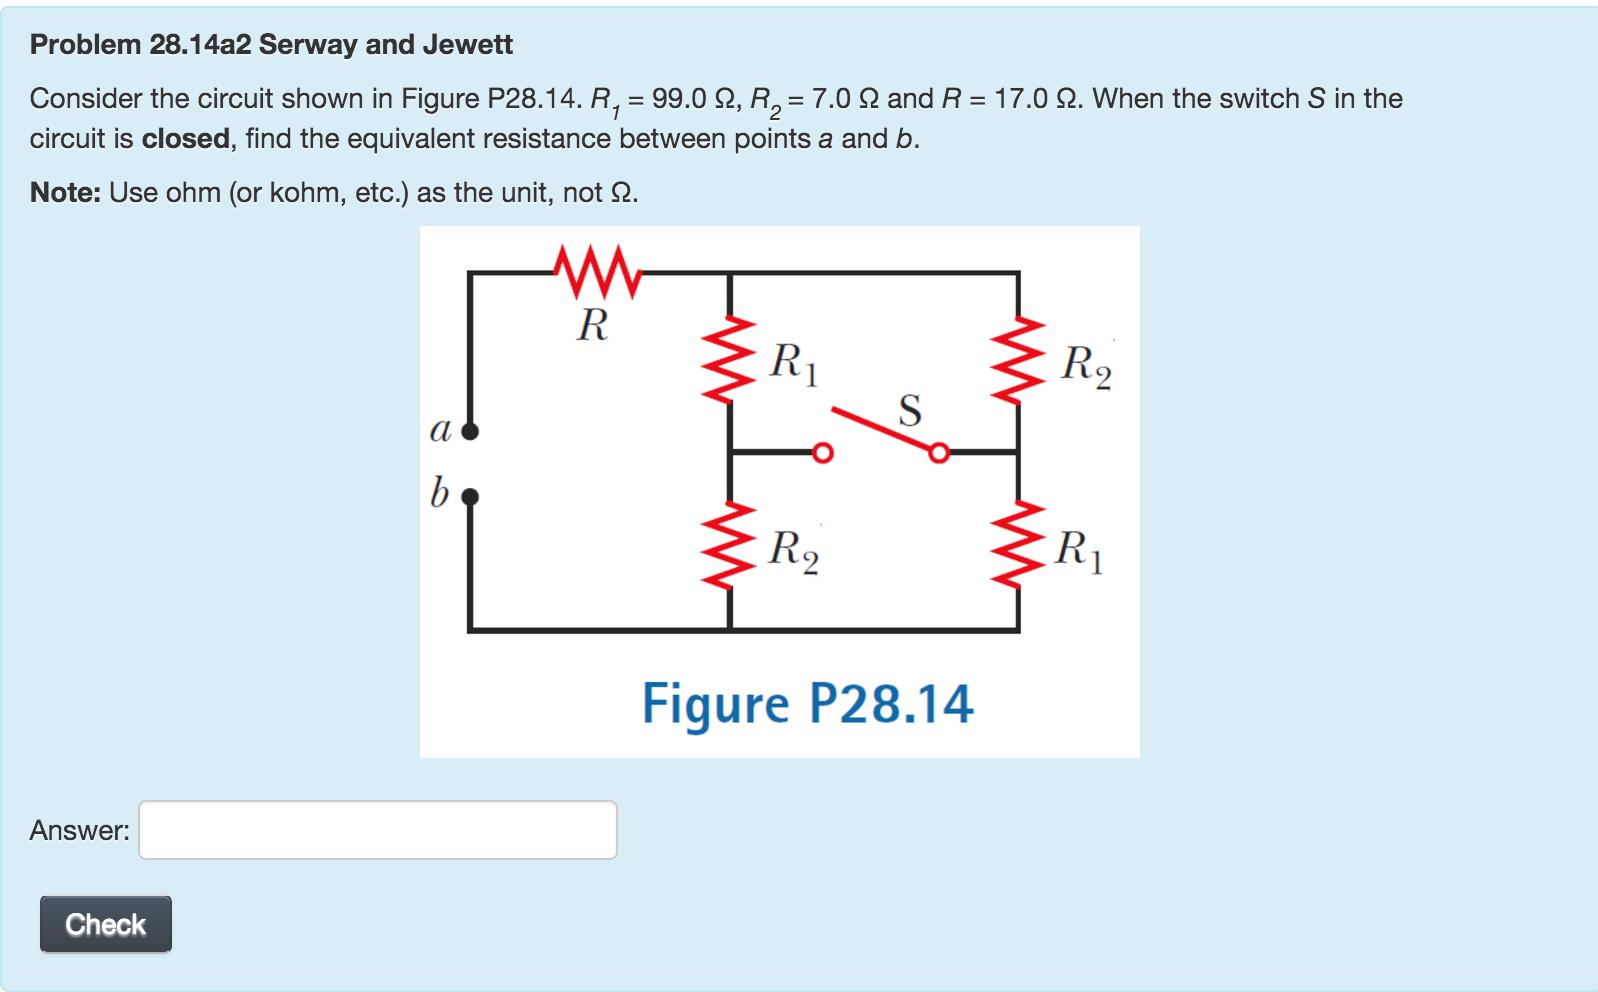 physics archive march 09 2016 chegg com rh chegg com Wiring Diagram Symbols Basic Electrical Schematic Diagrams